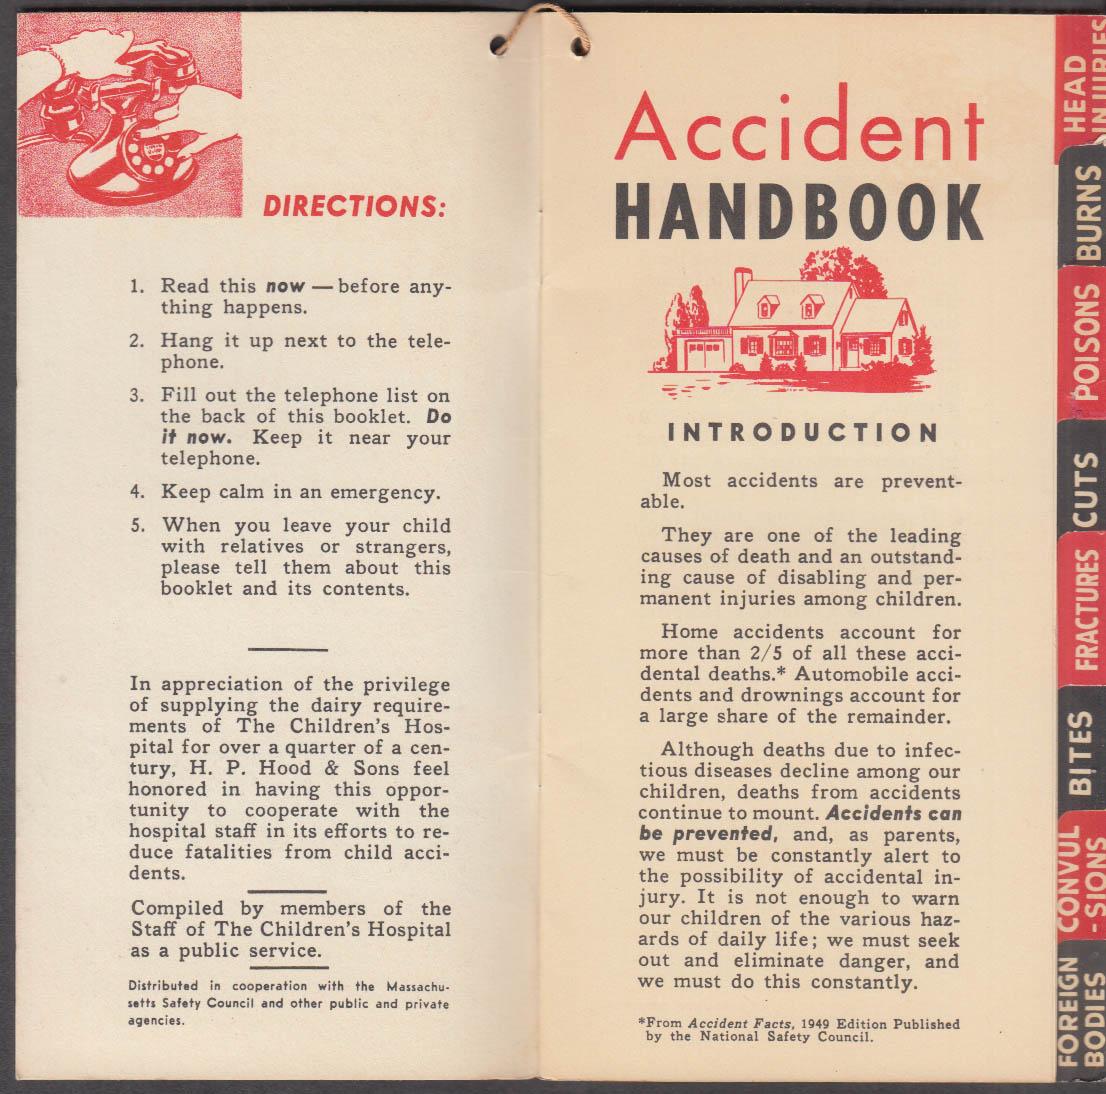 Children's Hospital Medical Center Accident Handbook Boston MA 1950